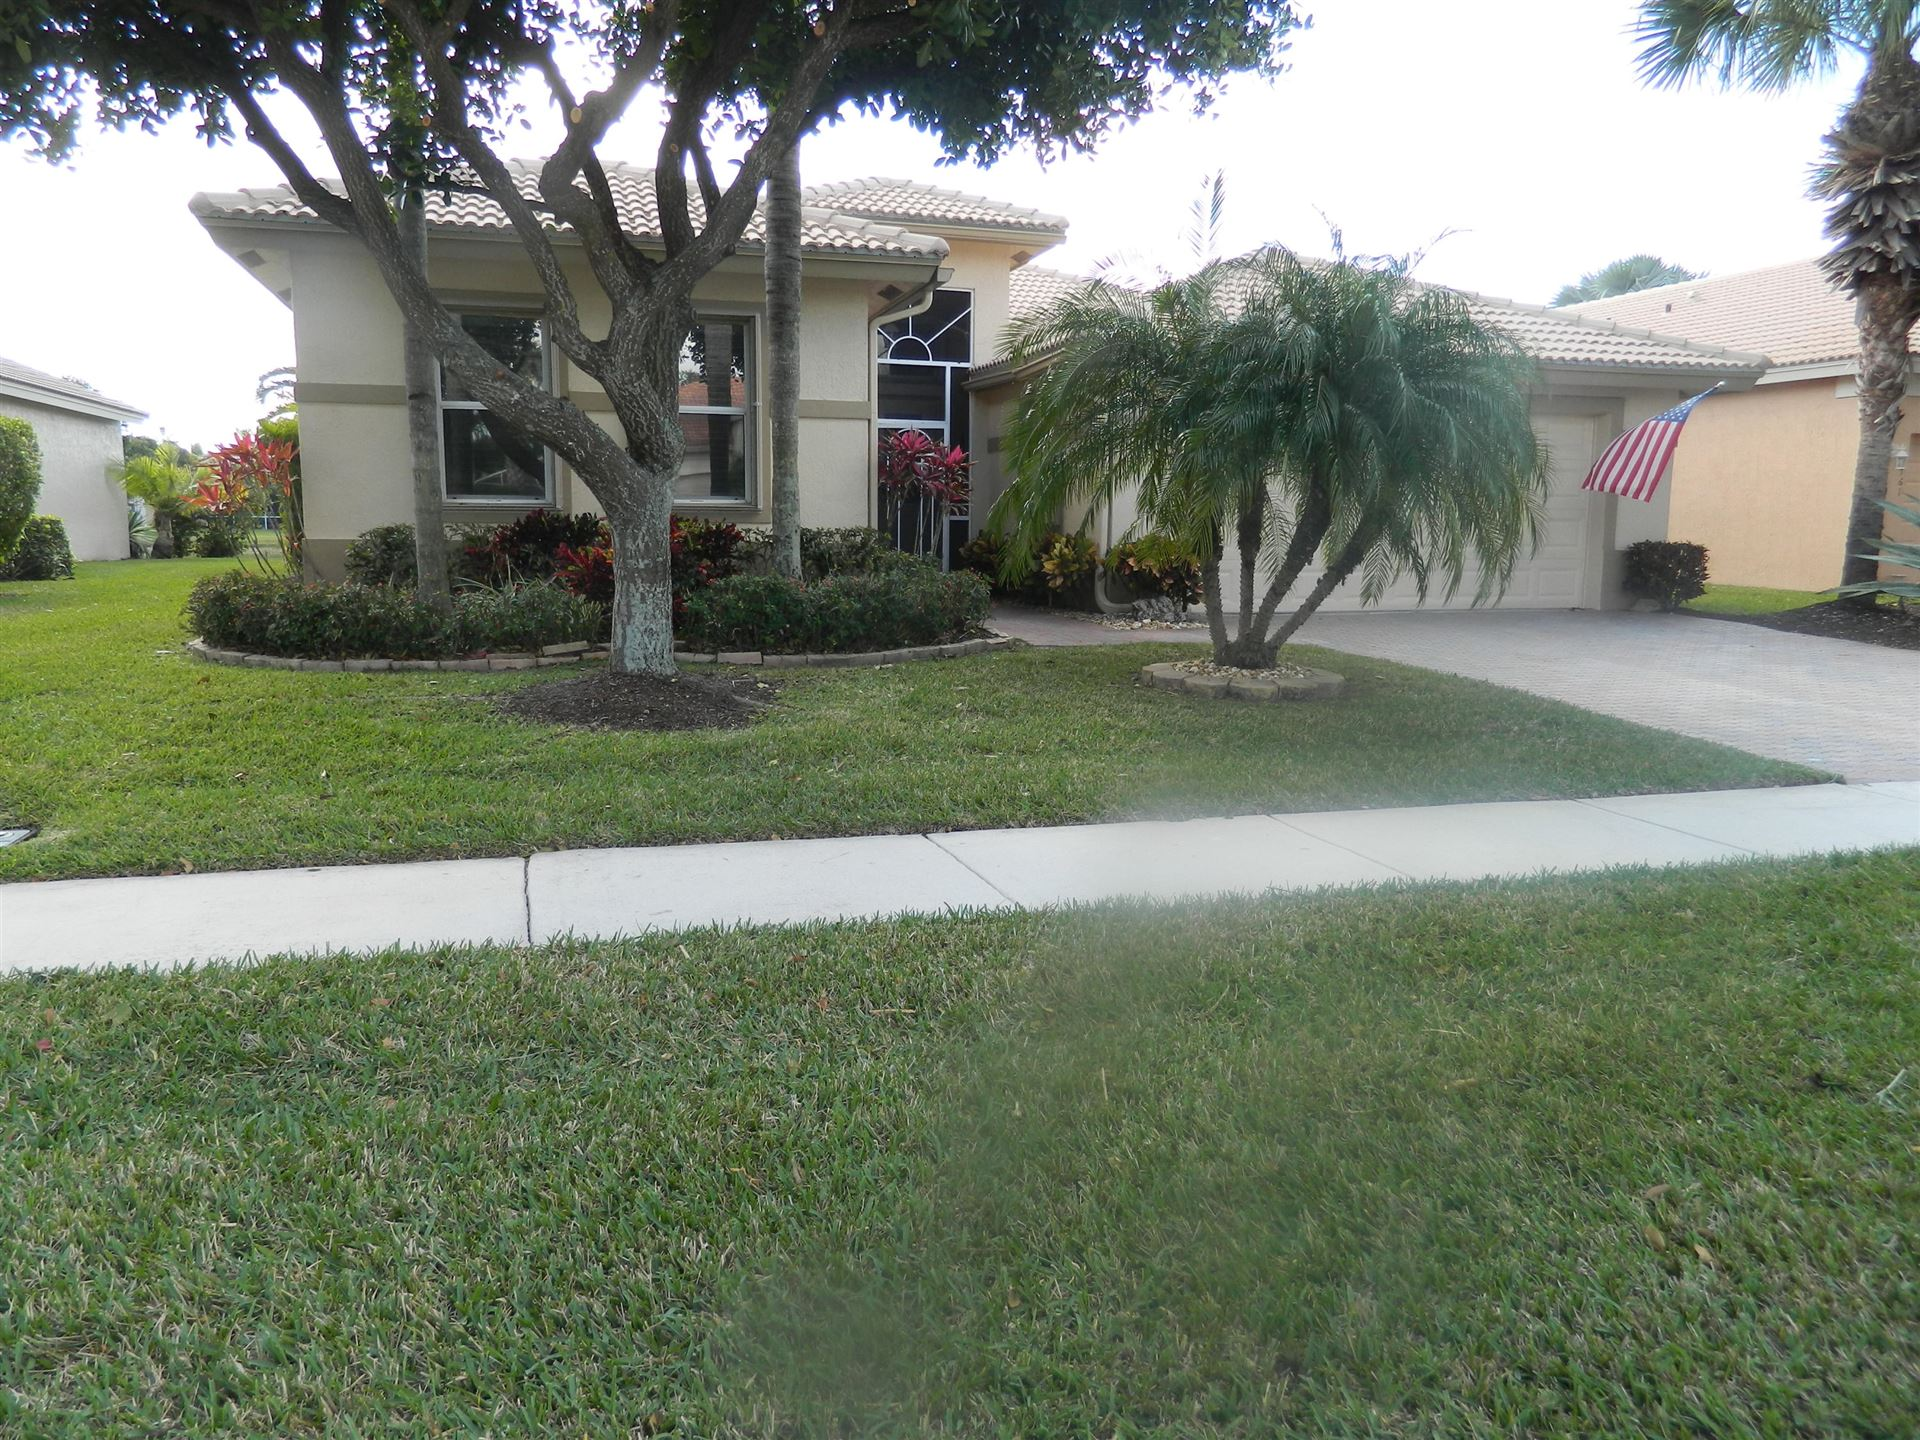 8767 Bellido Circle, Boynton Beach, FL 33472 - MLS#: RX-10662342